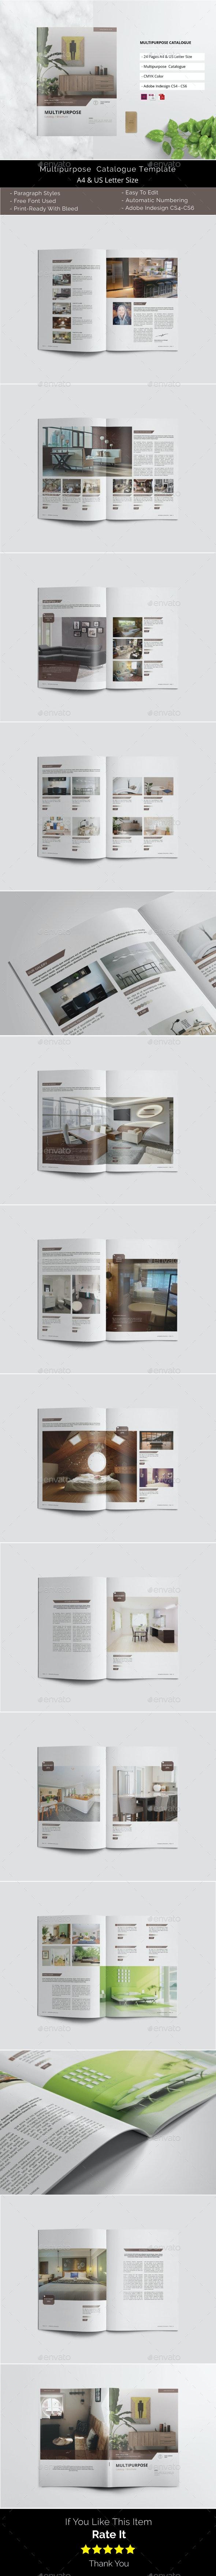 Multipurpose Catalogue / Brochure - Catalogs Brochures